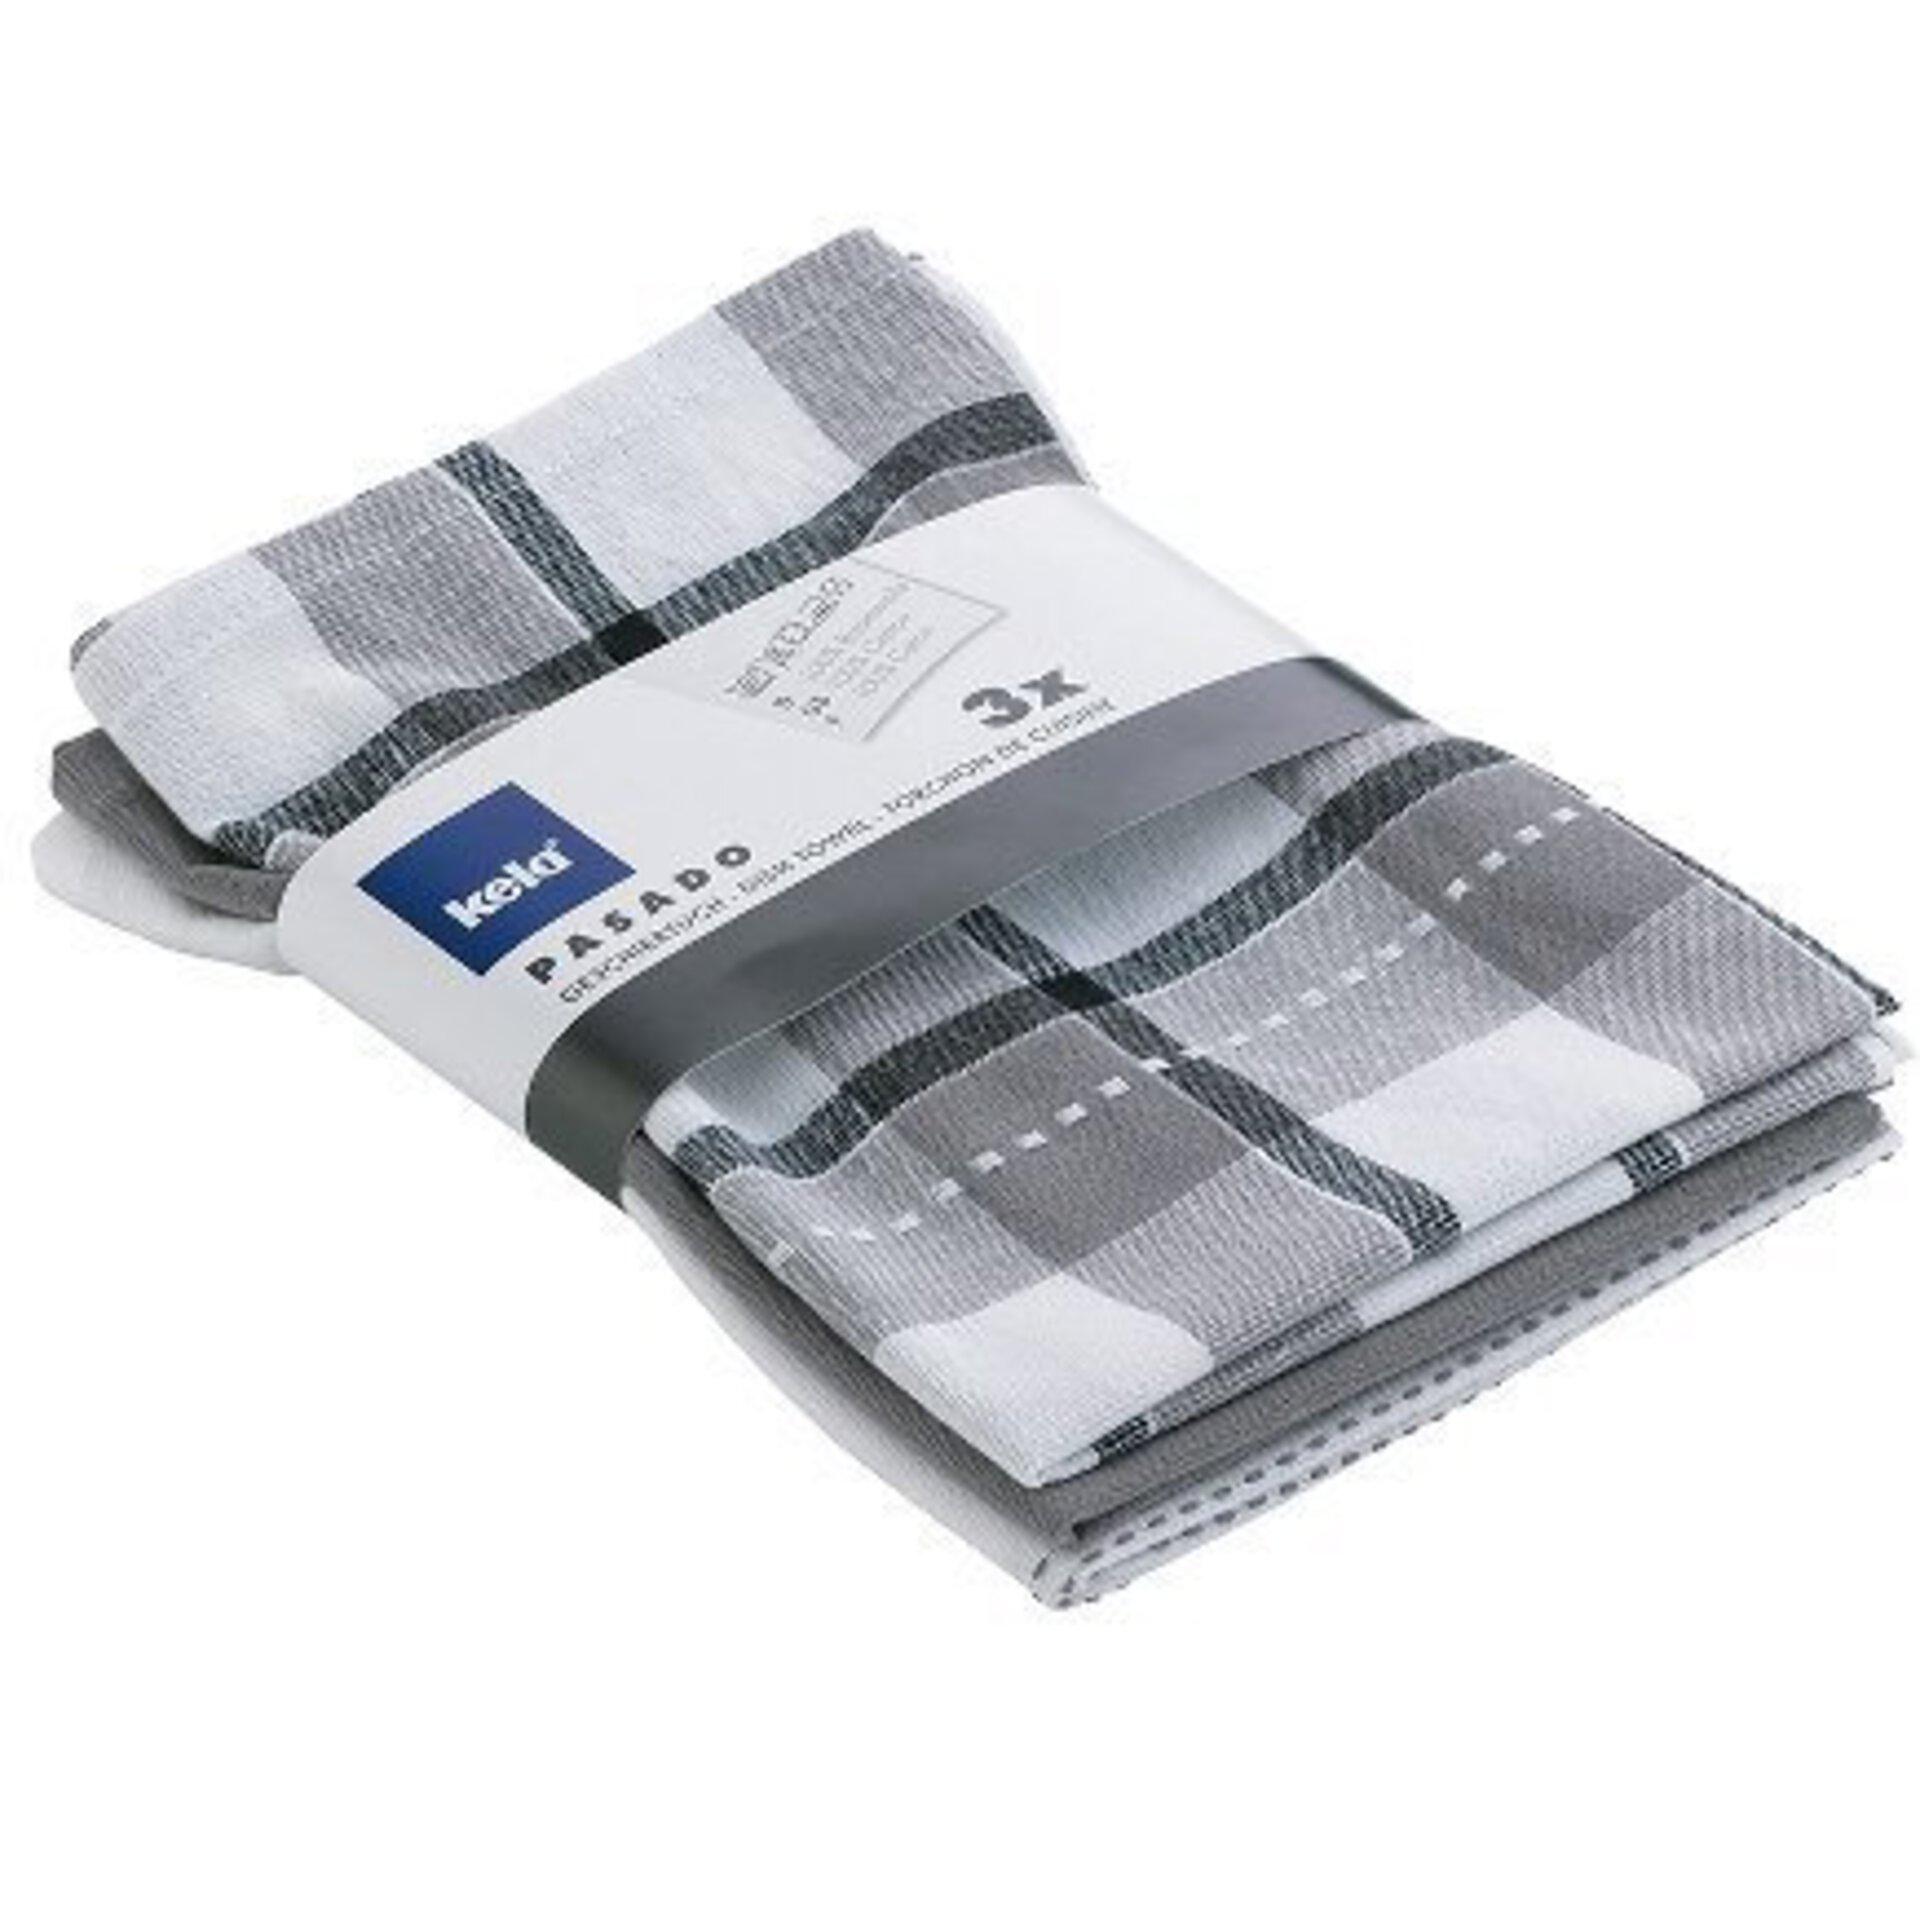 Geschirrtuch Pasado Kela Textil